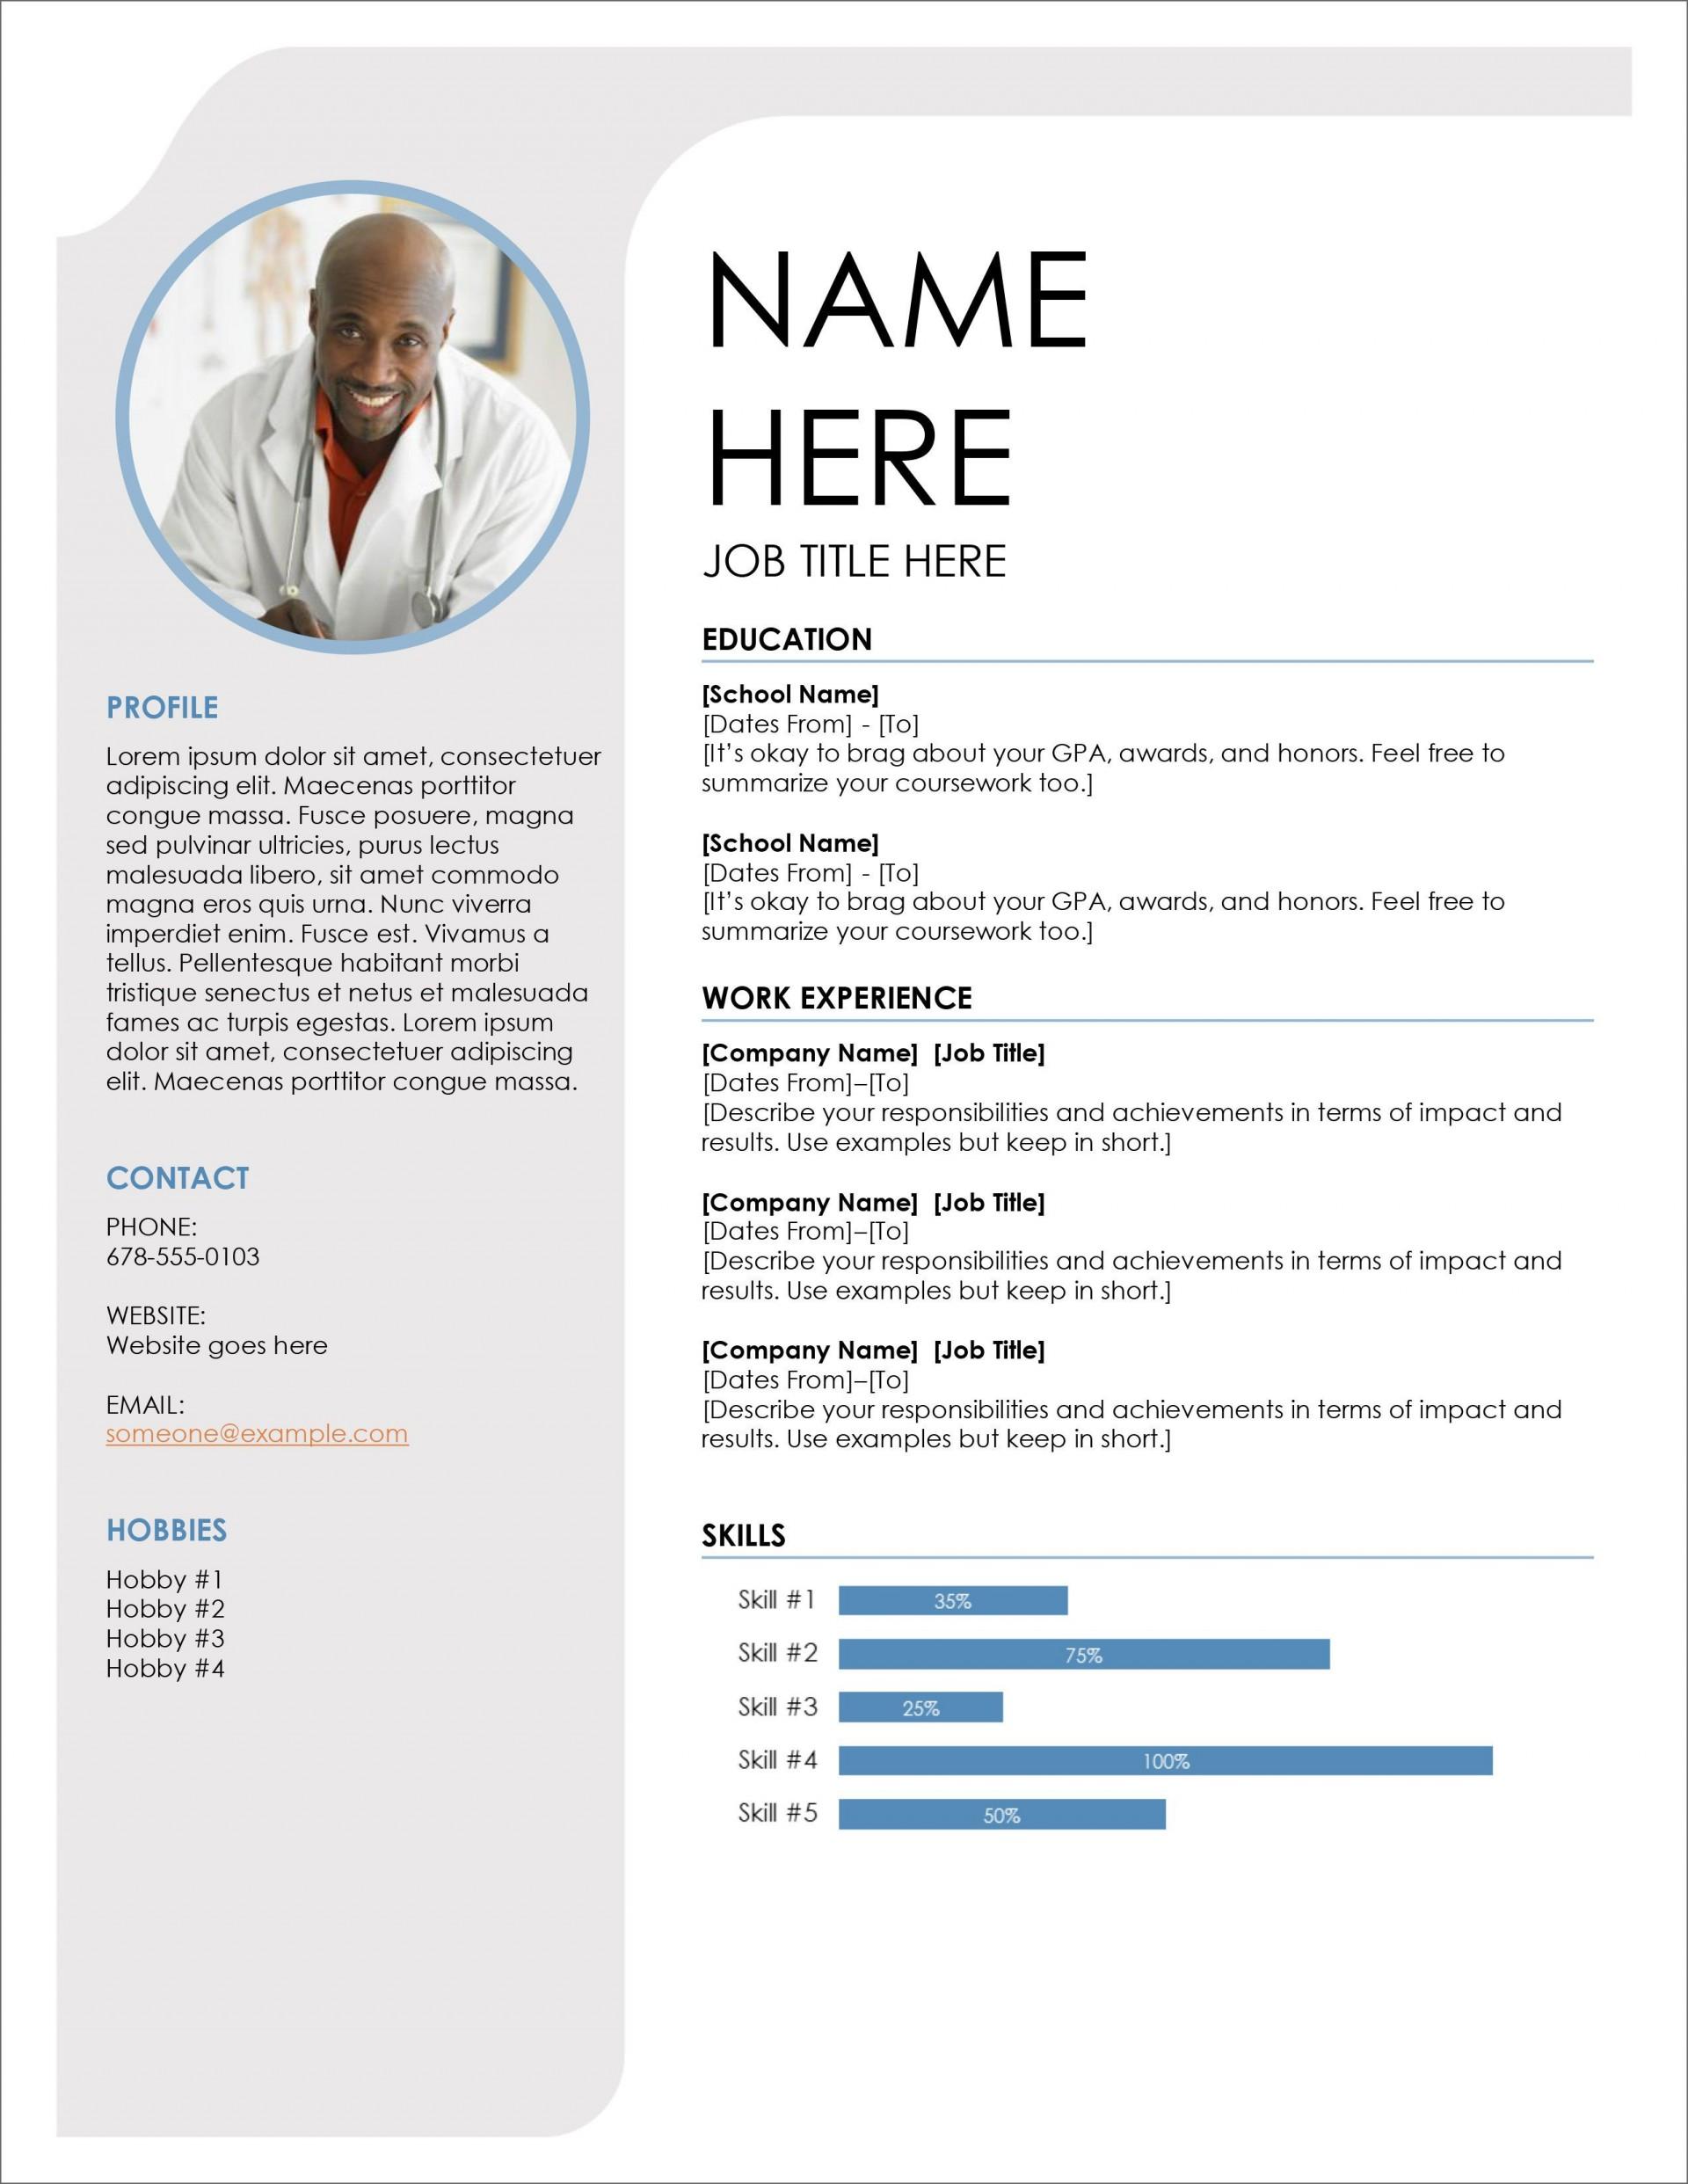 002 Best Resume Template Word 2003 Free Download Idea  Downloads1920